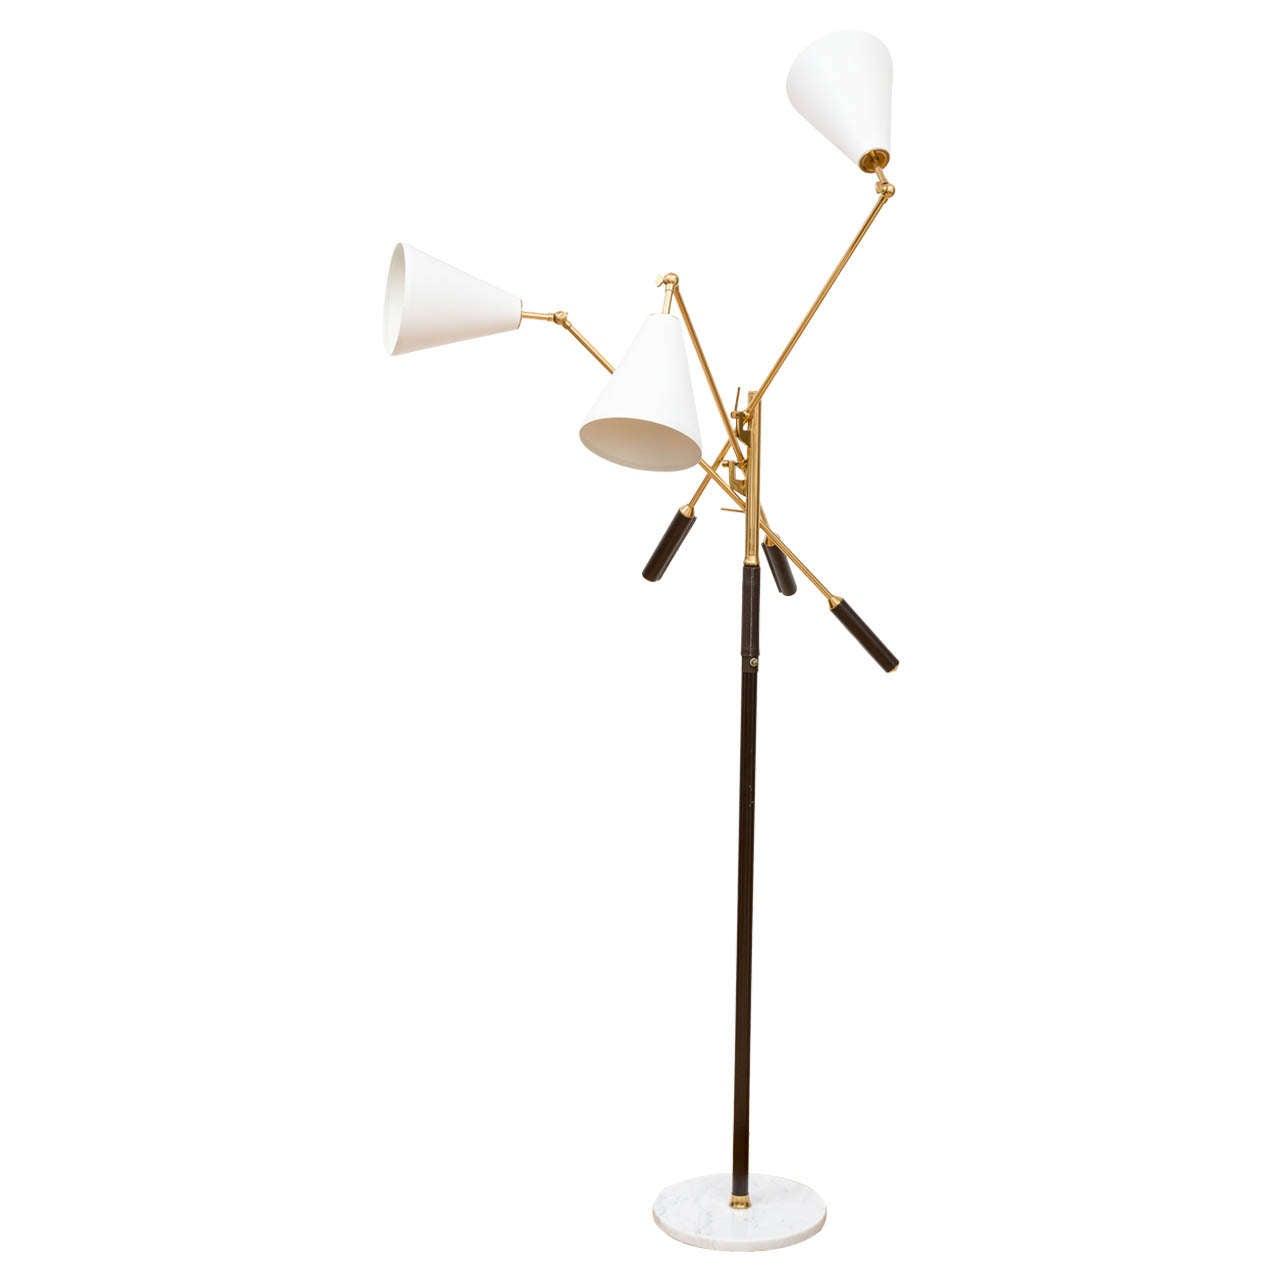 Arredoluce triennale brass floor lamp at 1stdibs for Arredo luce